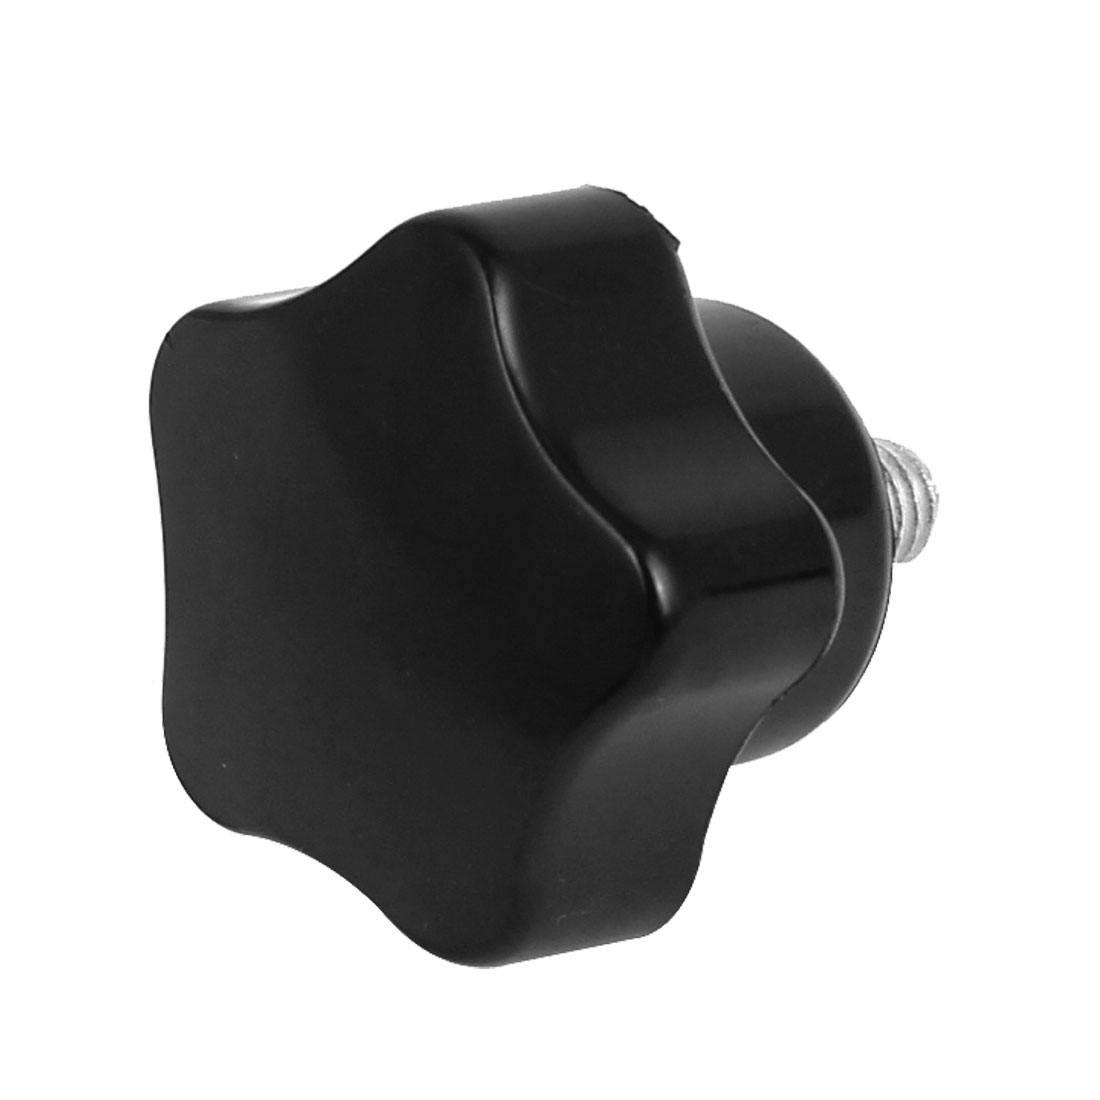 M6 x 10mm Plastic Star Head Screw On Type Clamping Knob Grip Black